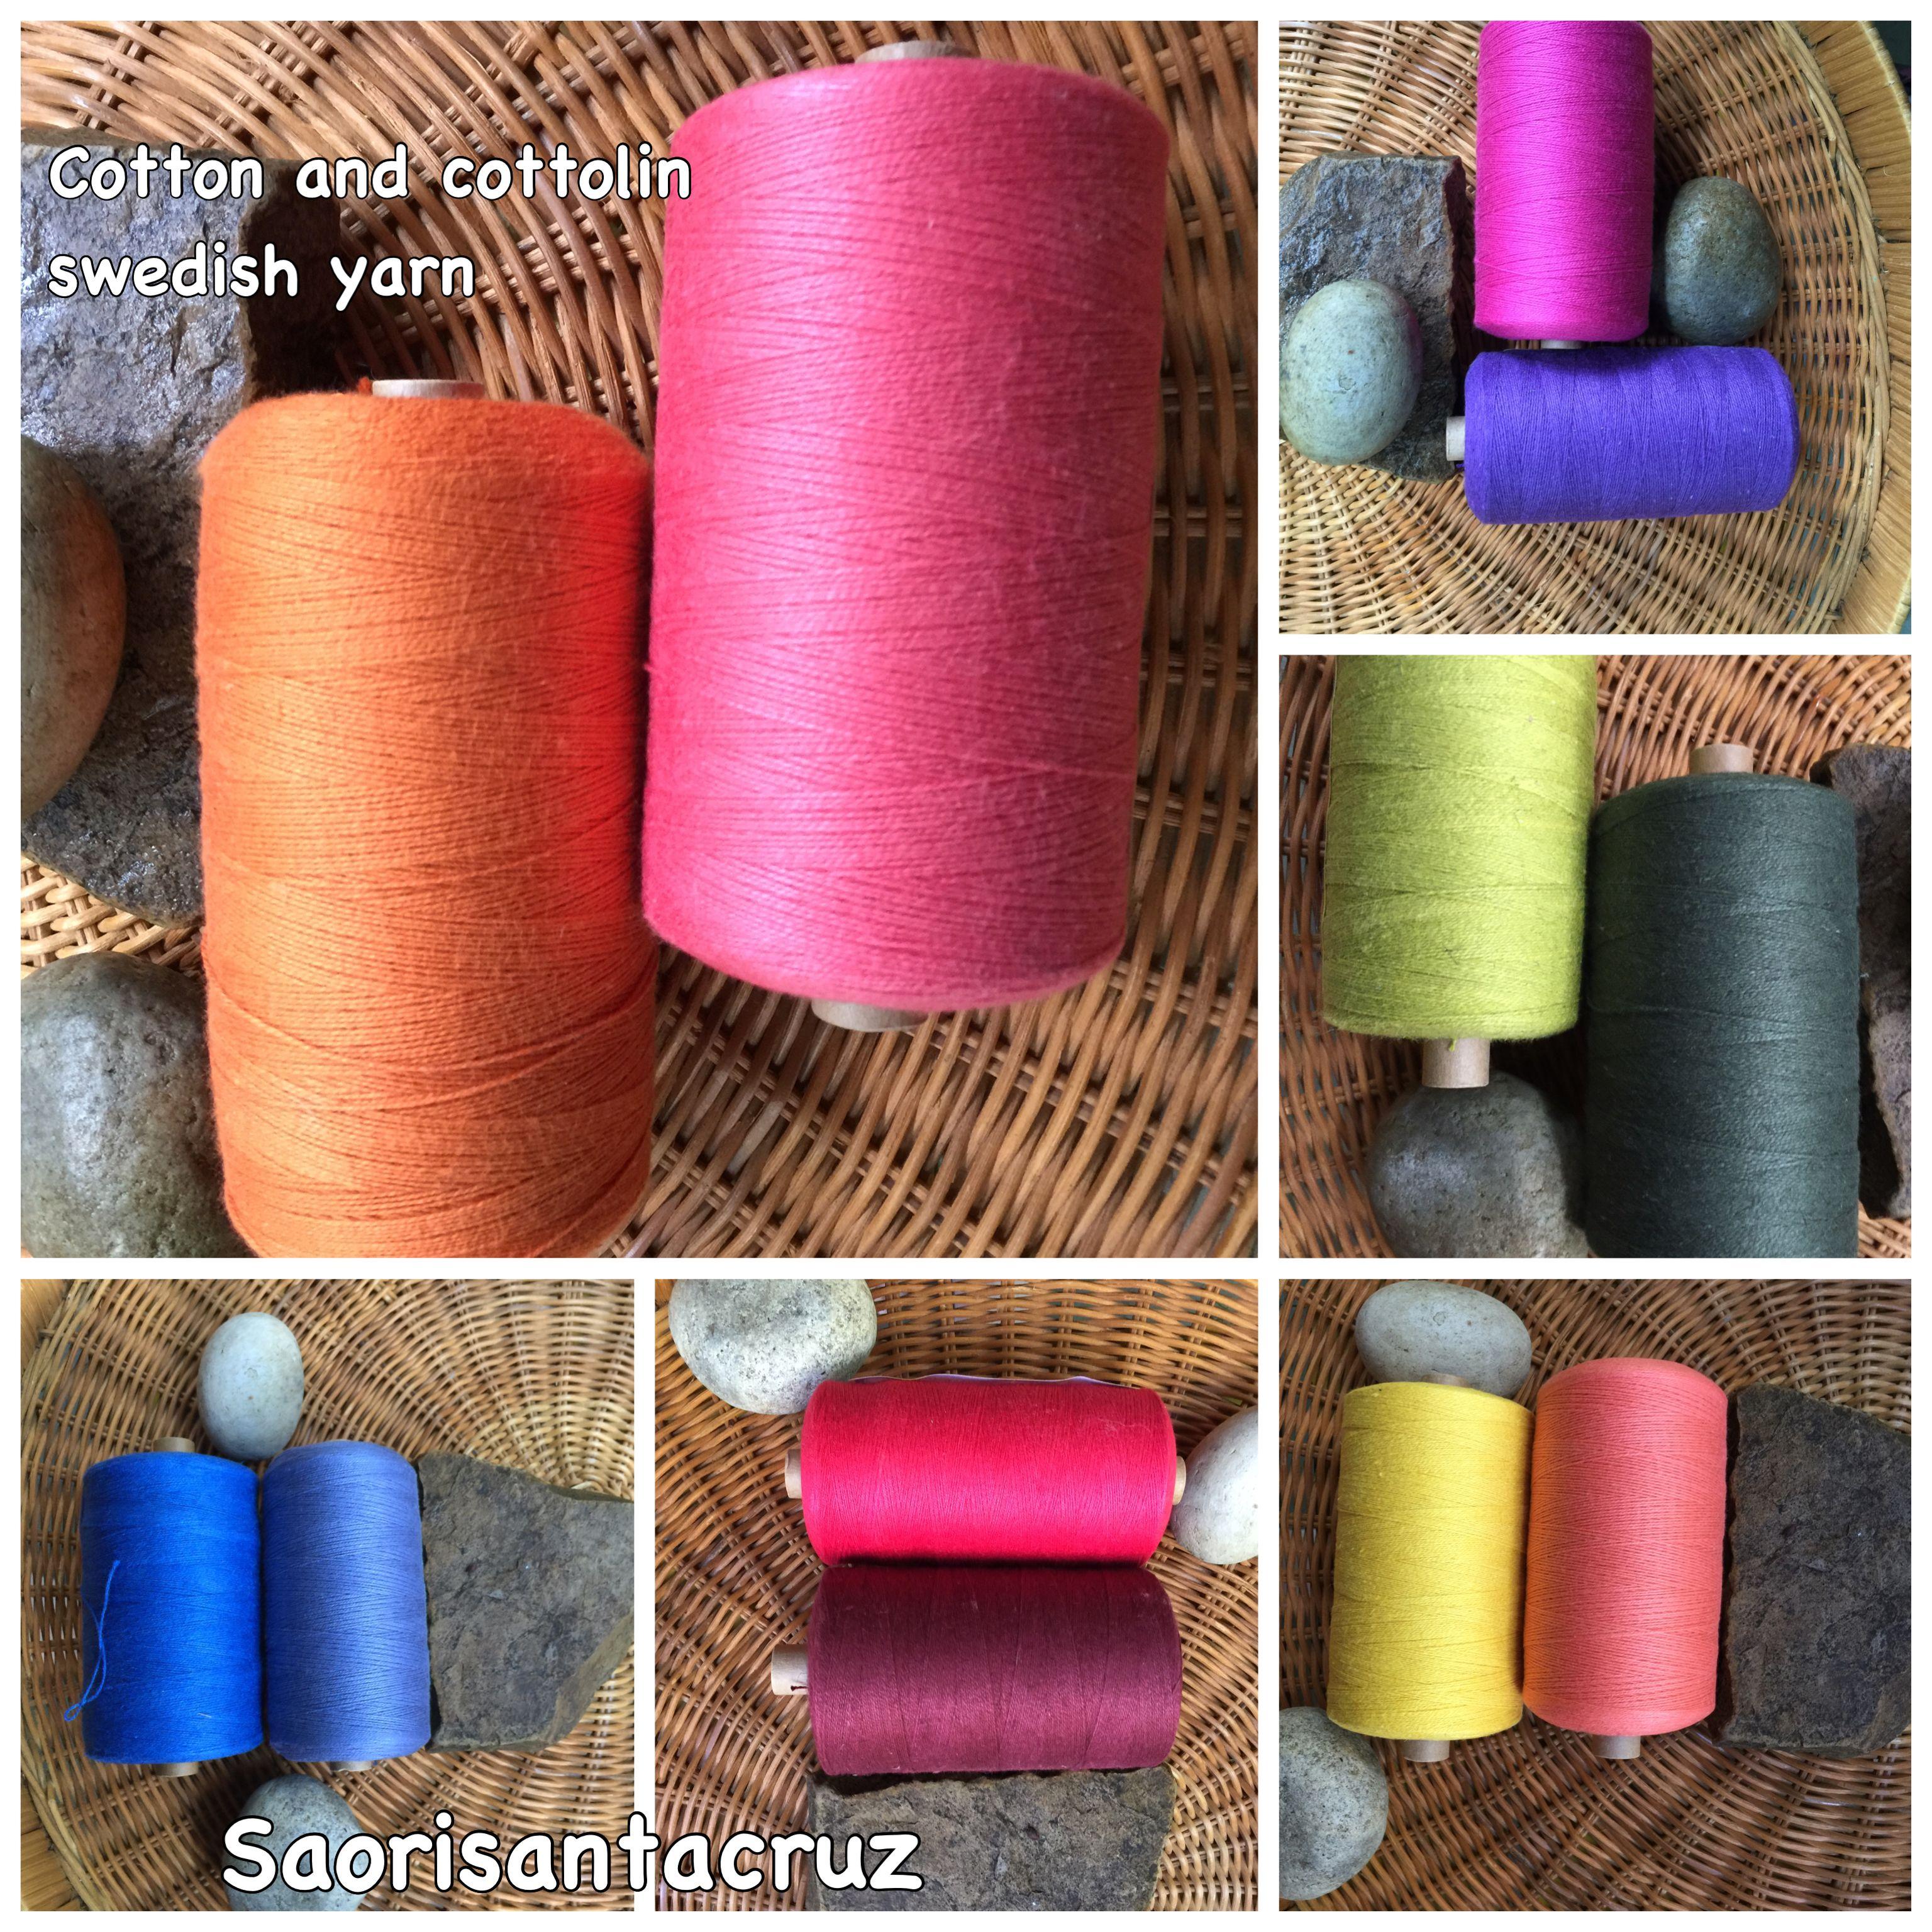 saorisantacruz Organic cotton and cottonlin 15 cone weaving yarns setweaving rainbows